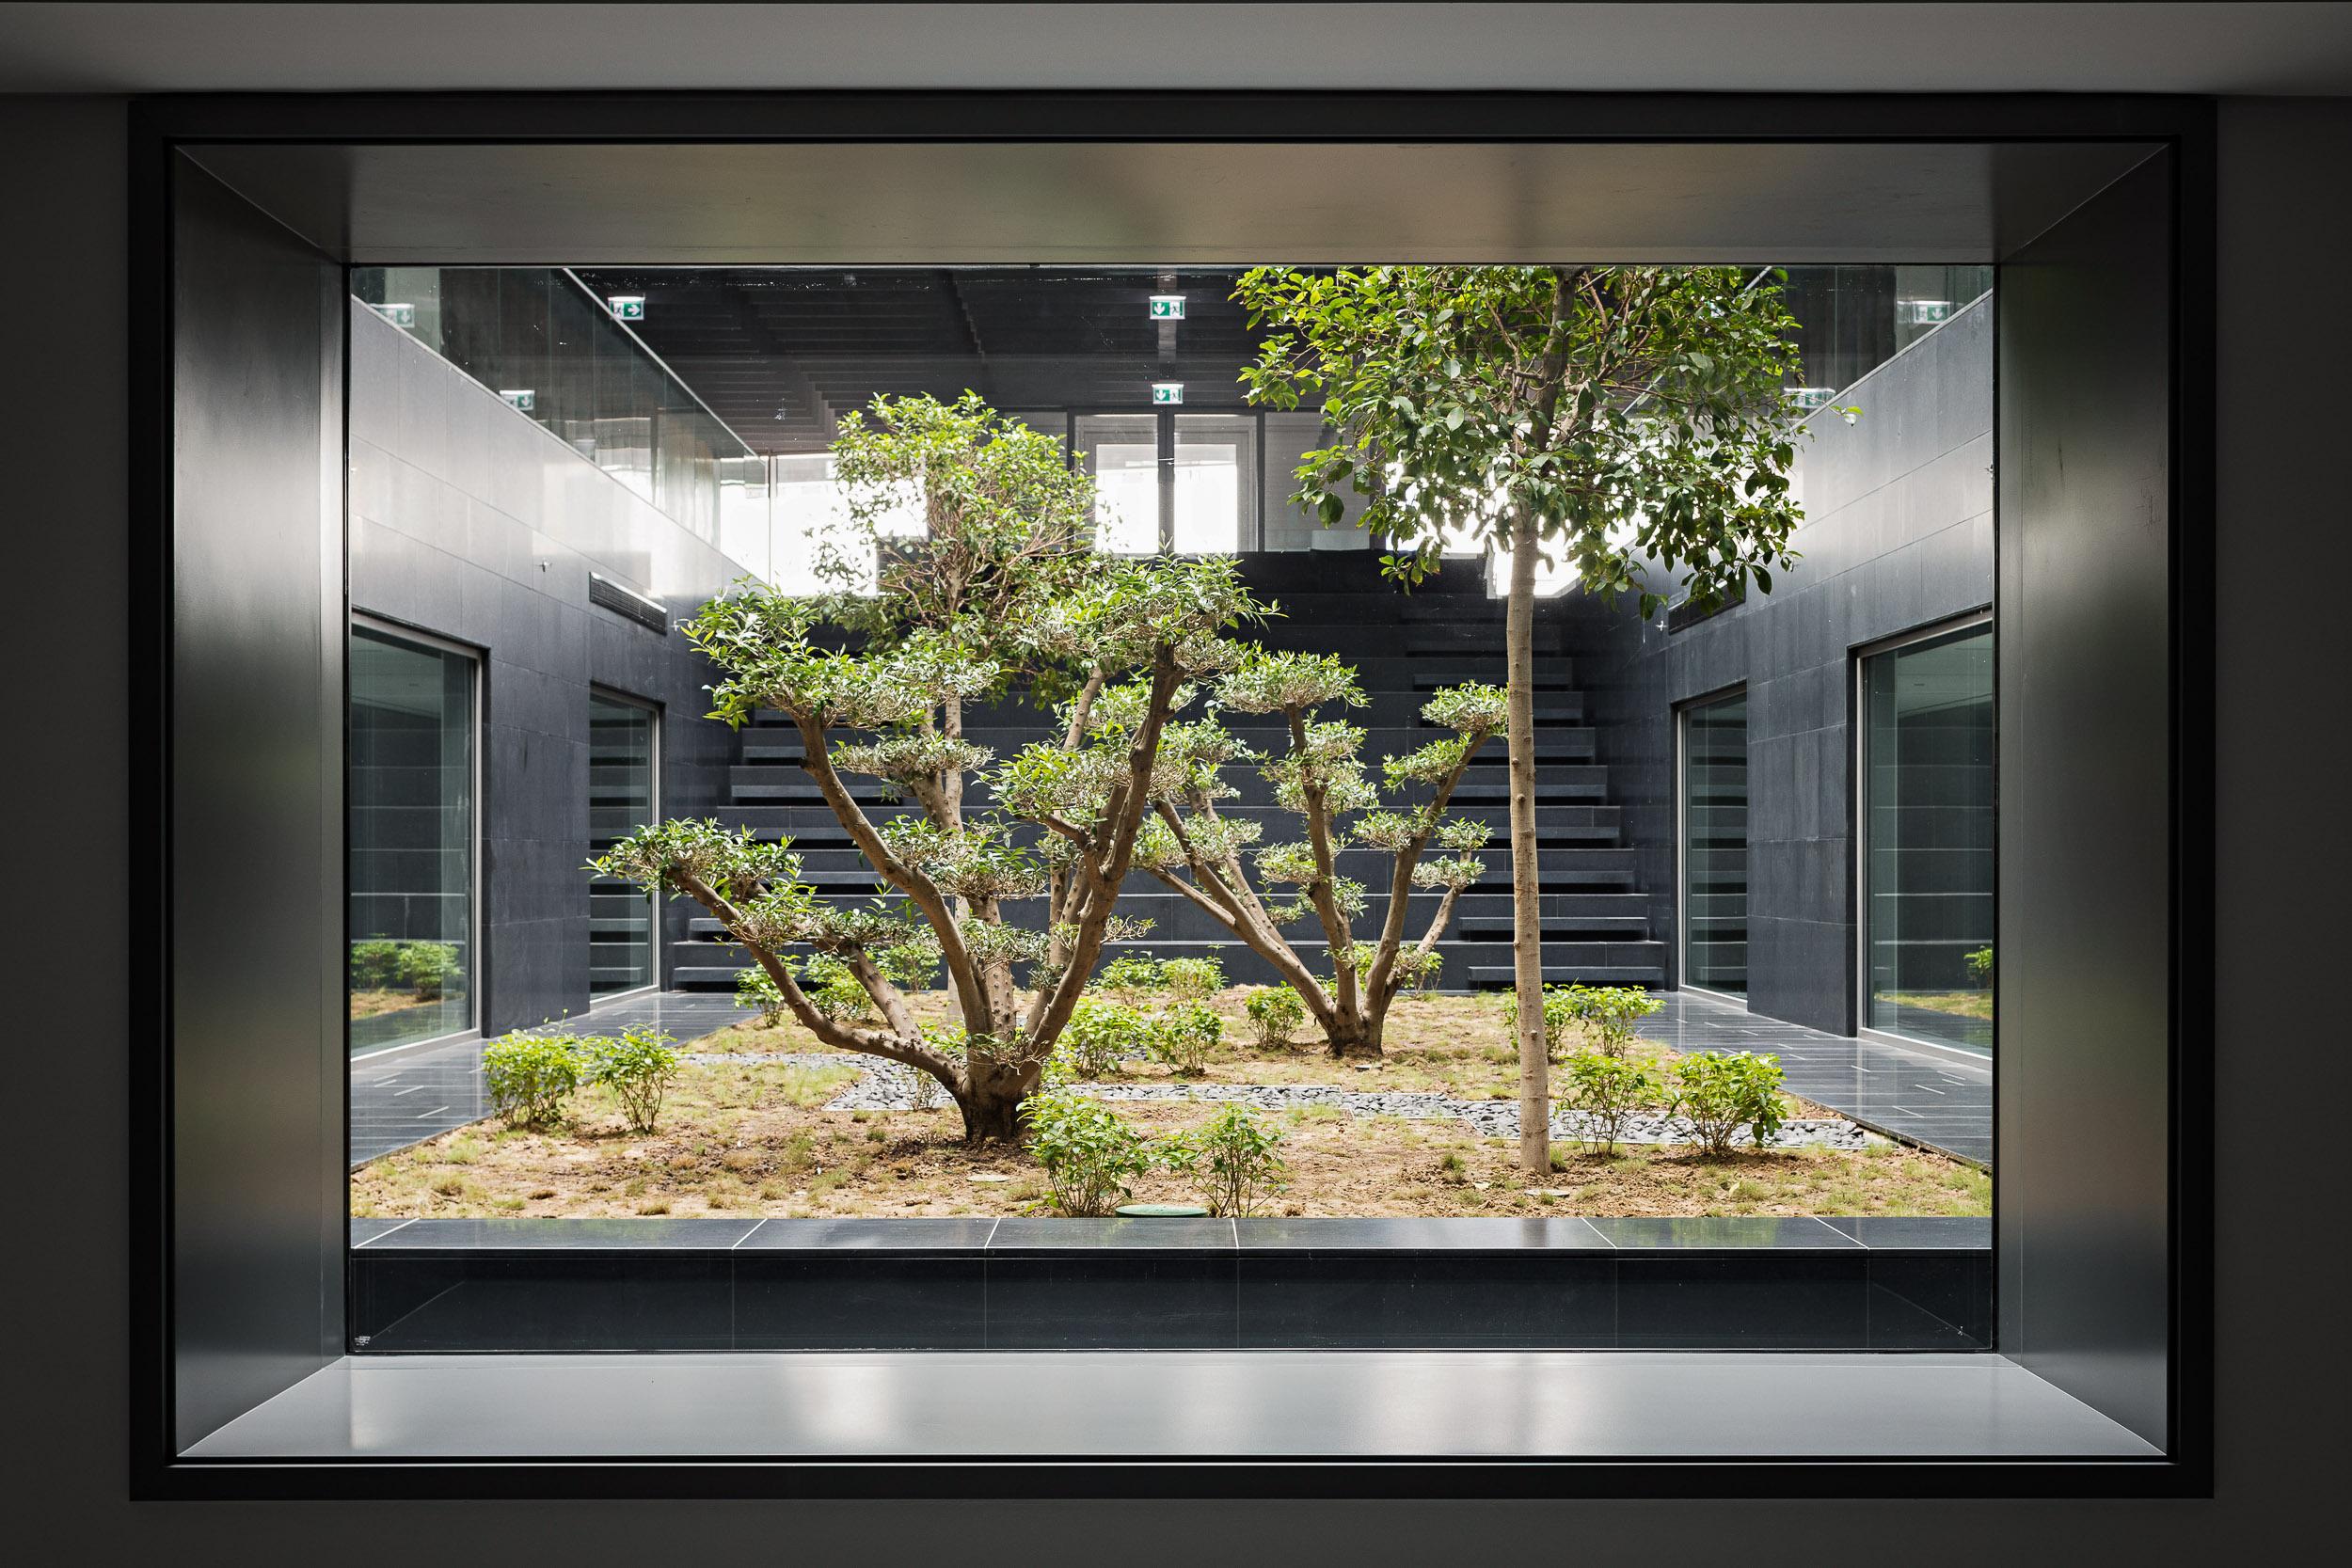 Architecture Studio Seddiqi Dubai 2018 +Yann Deret-7238.JPG